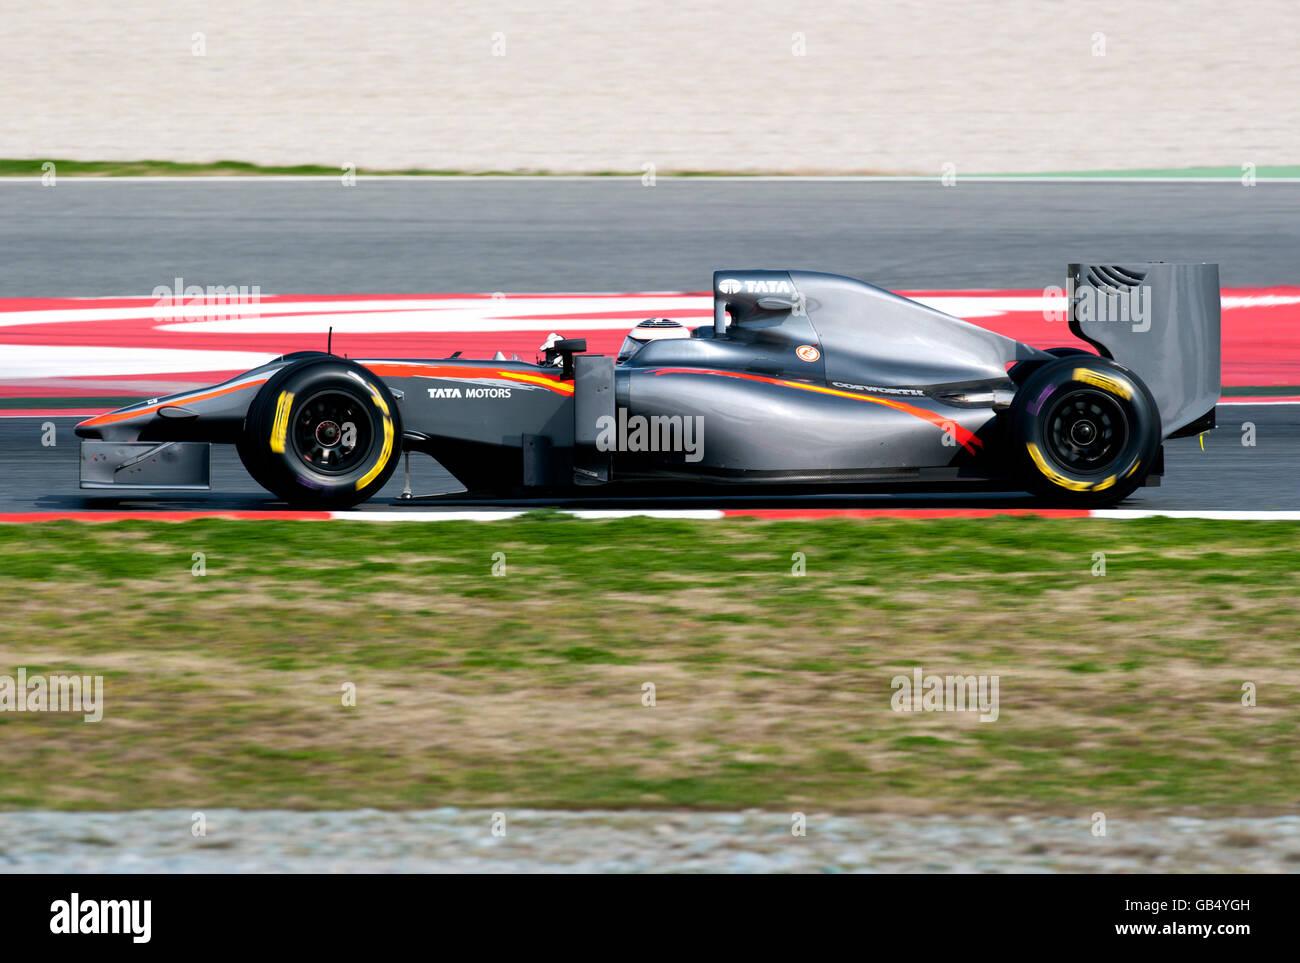 Schweizer Testfahrer Giorgio Mondini In Seinem Hrt F1 Team Cosworth